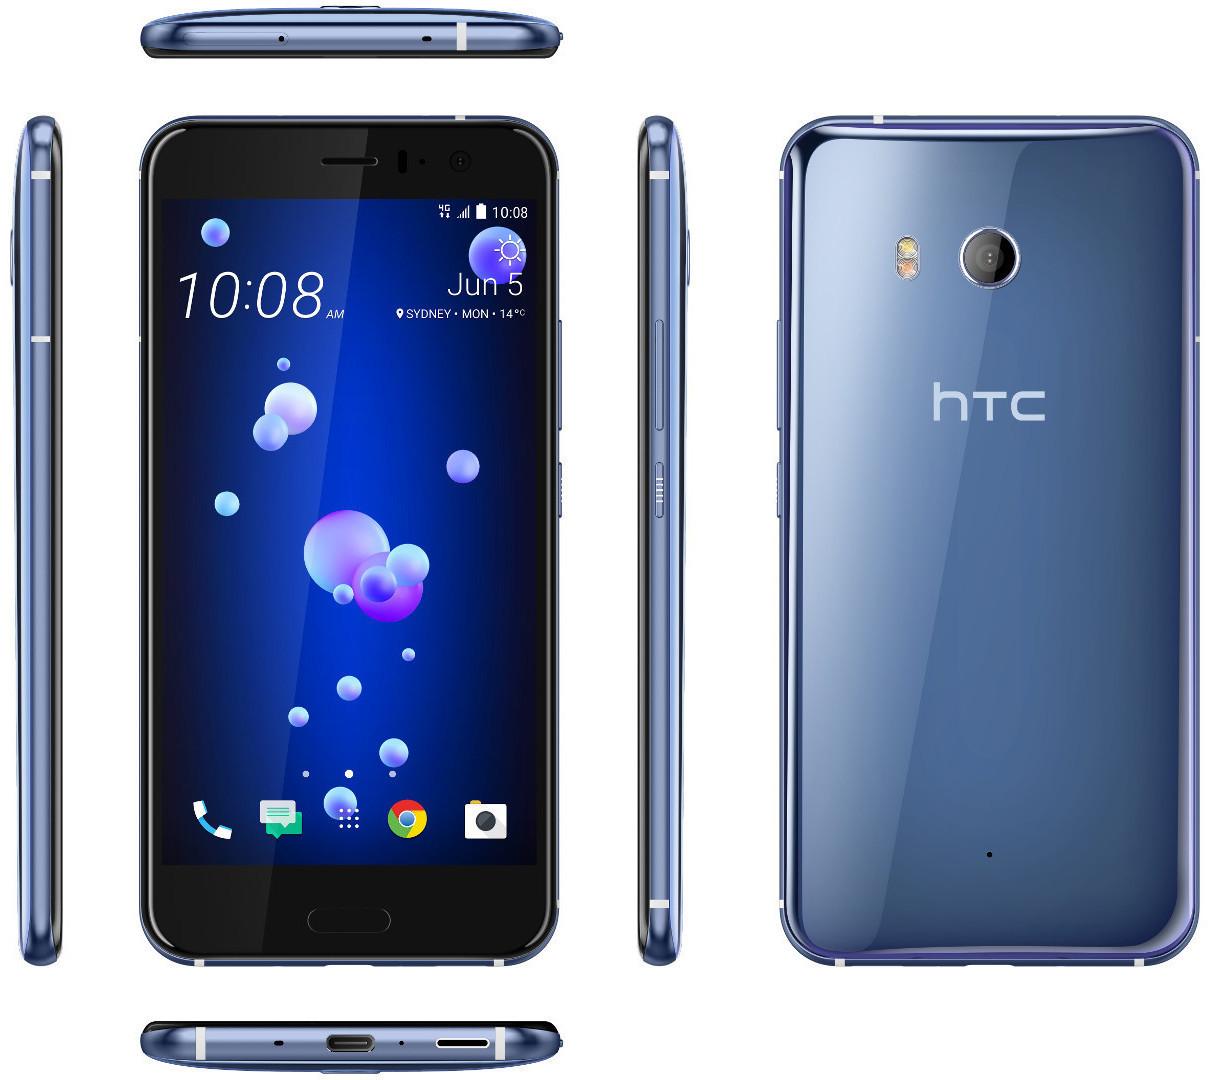 HTC U11 USA Dual SIM - Specs and Price - Phonegg